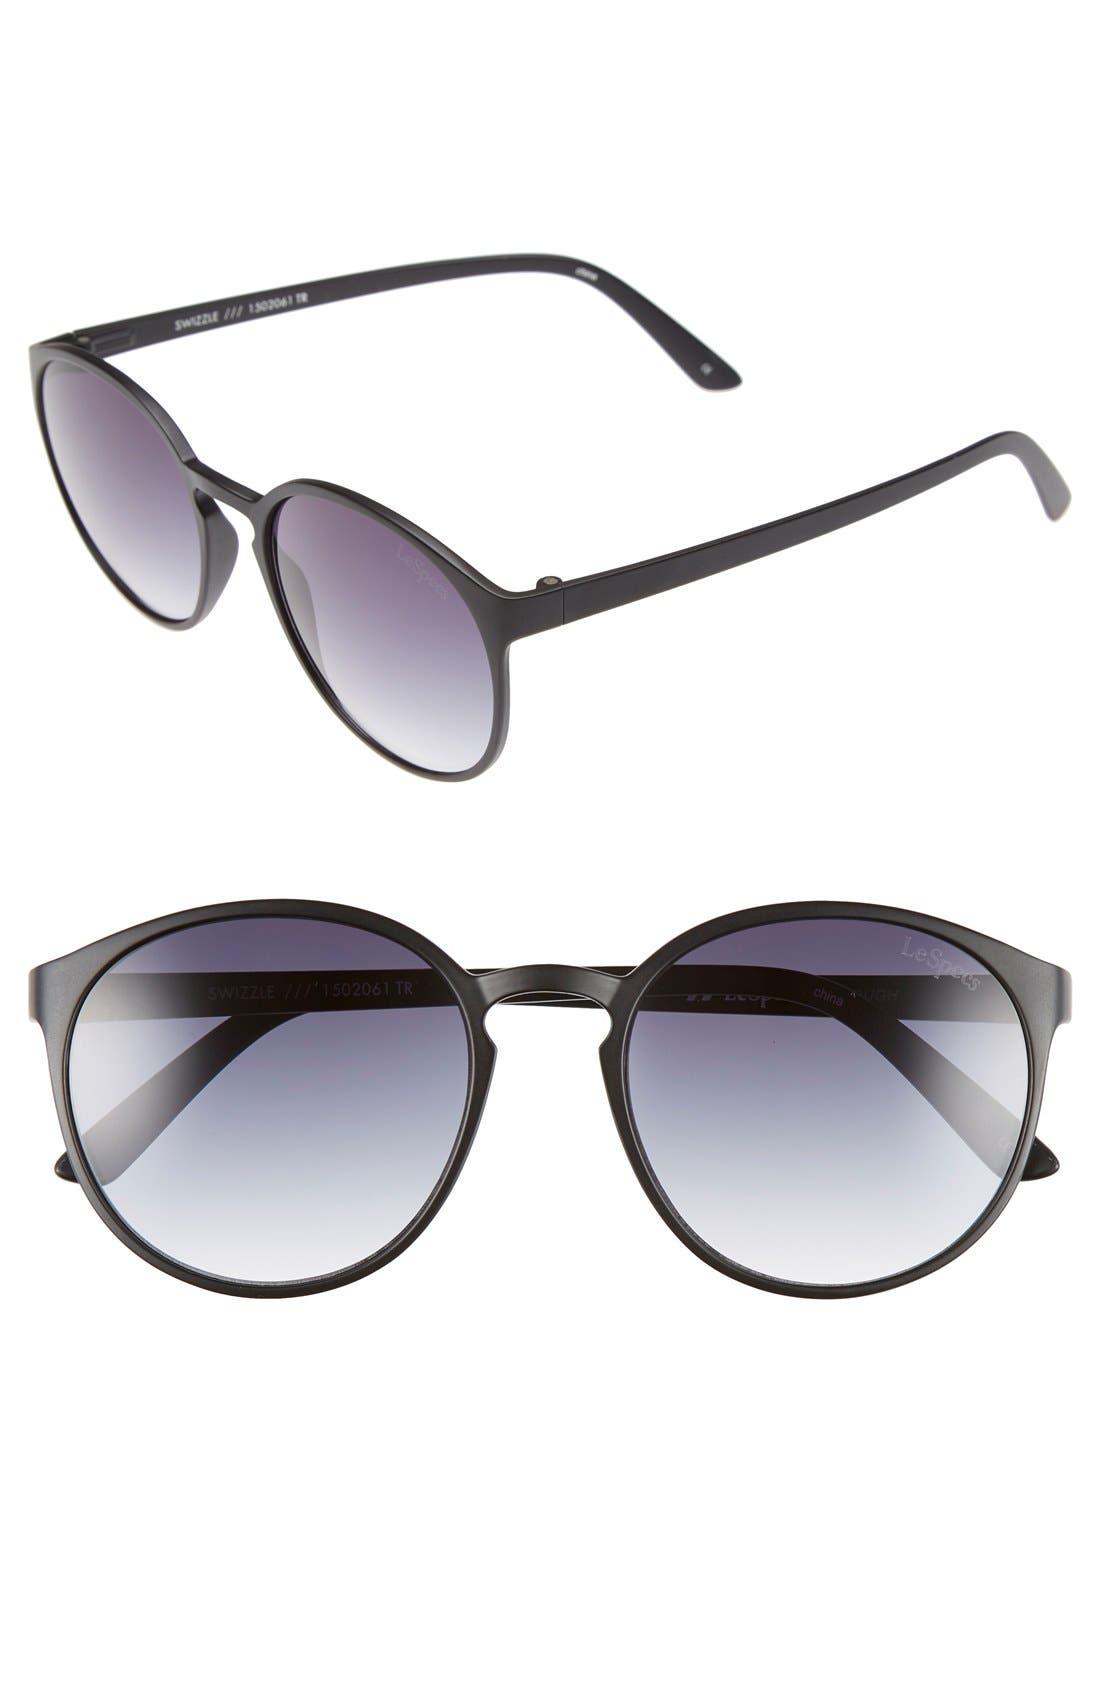 Alternate Image 1 Selected - Le Specs 'Swizzle' 53mm Sunglasses